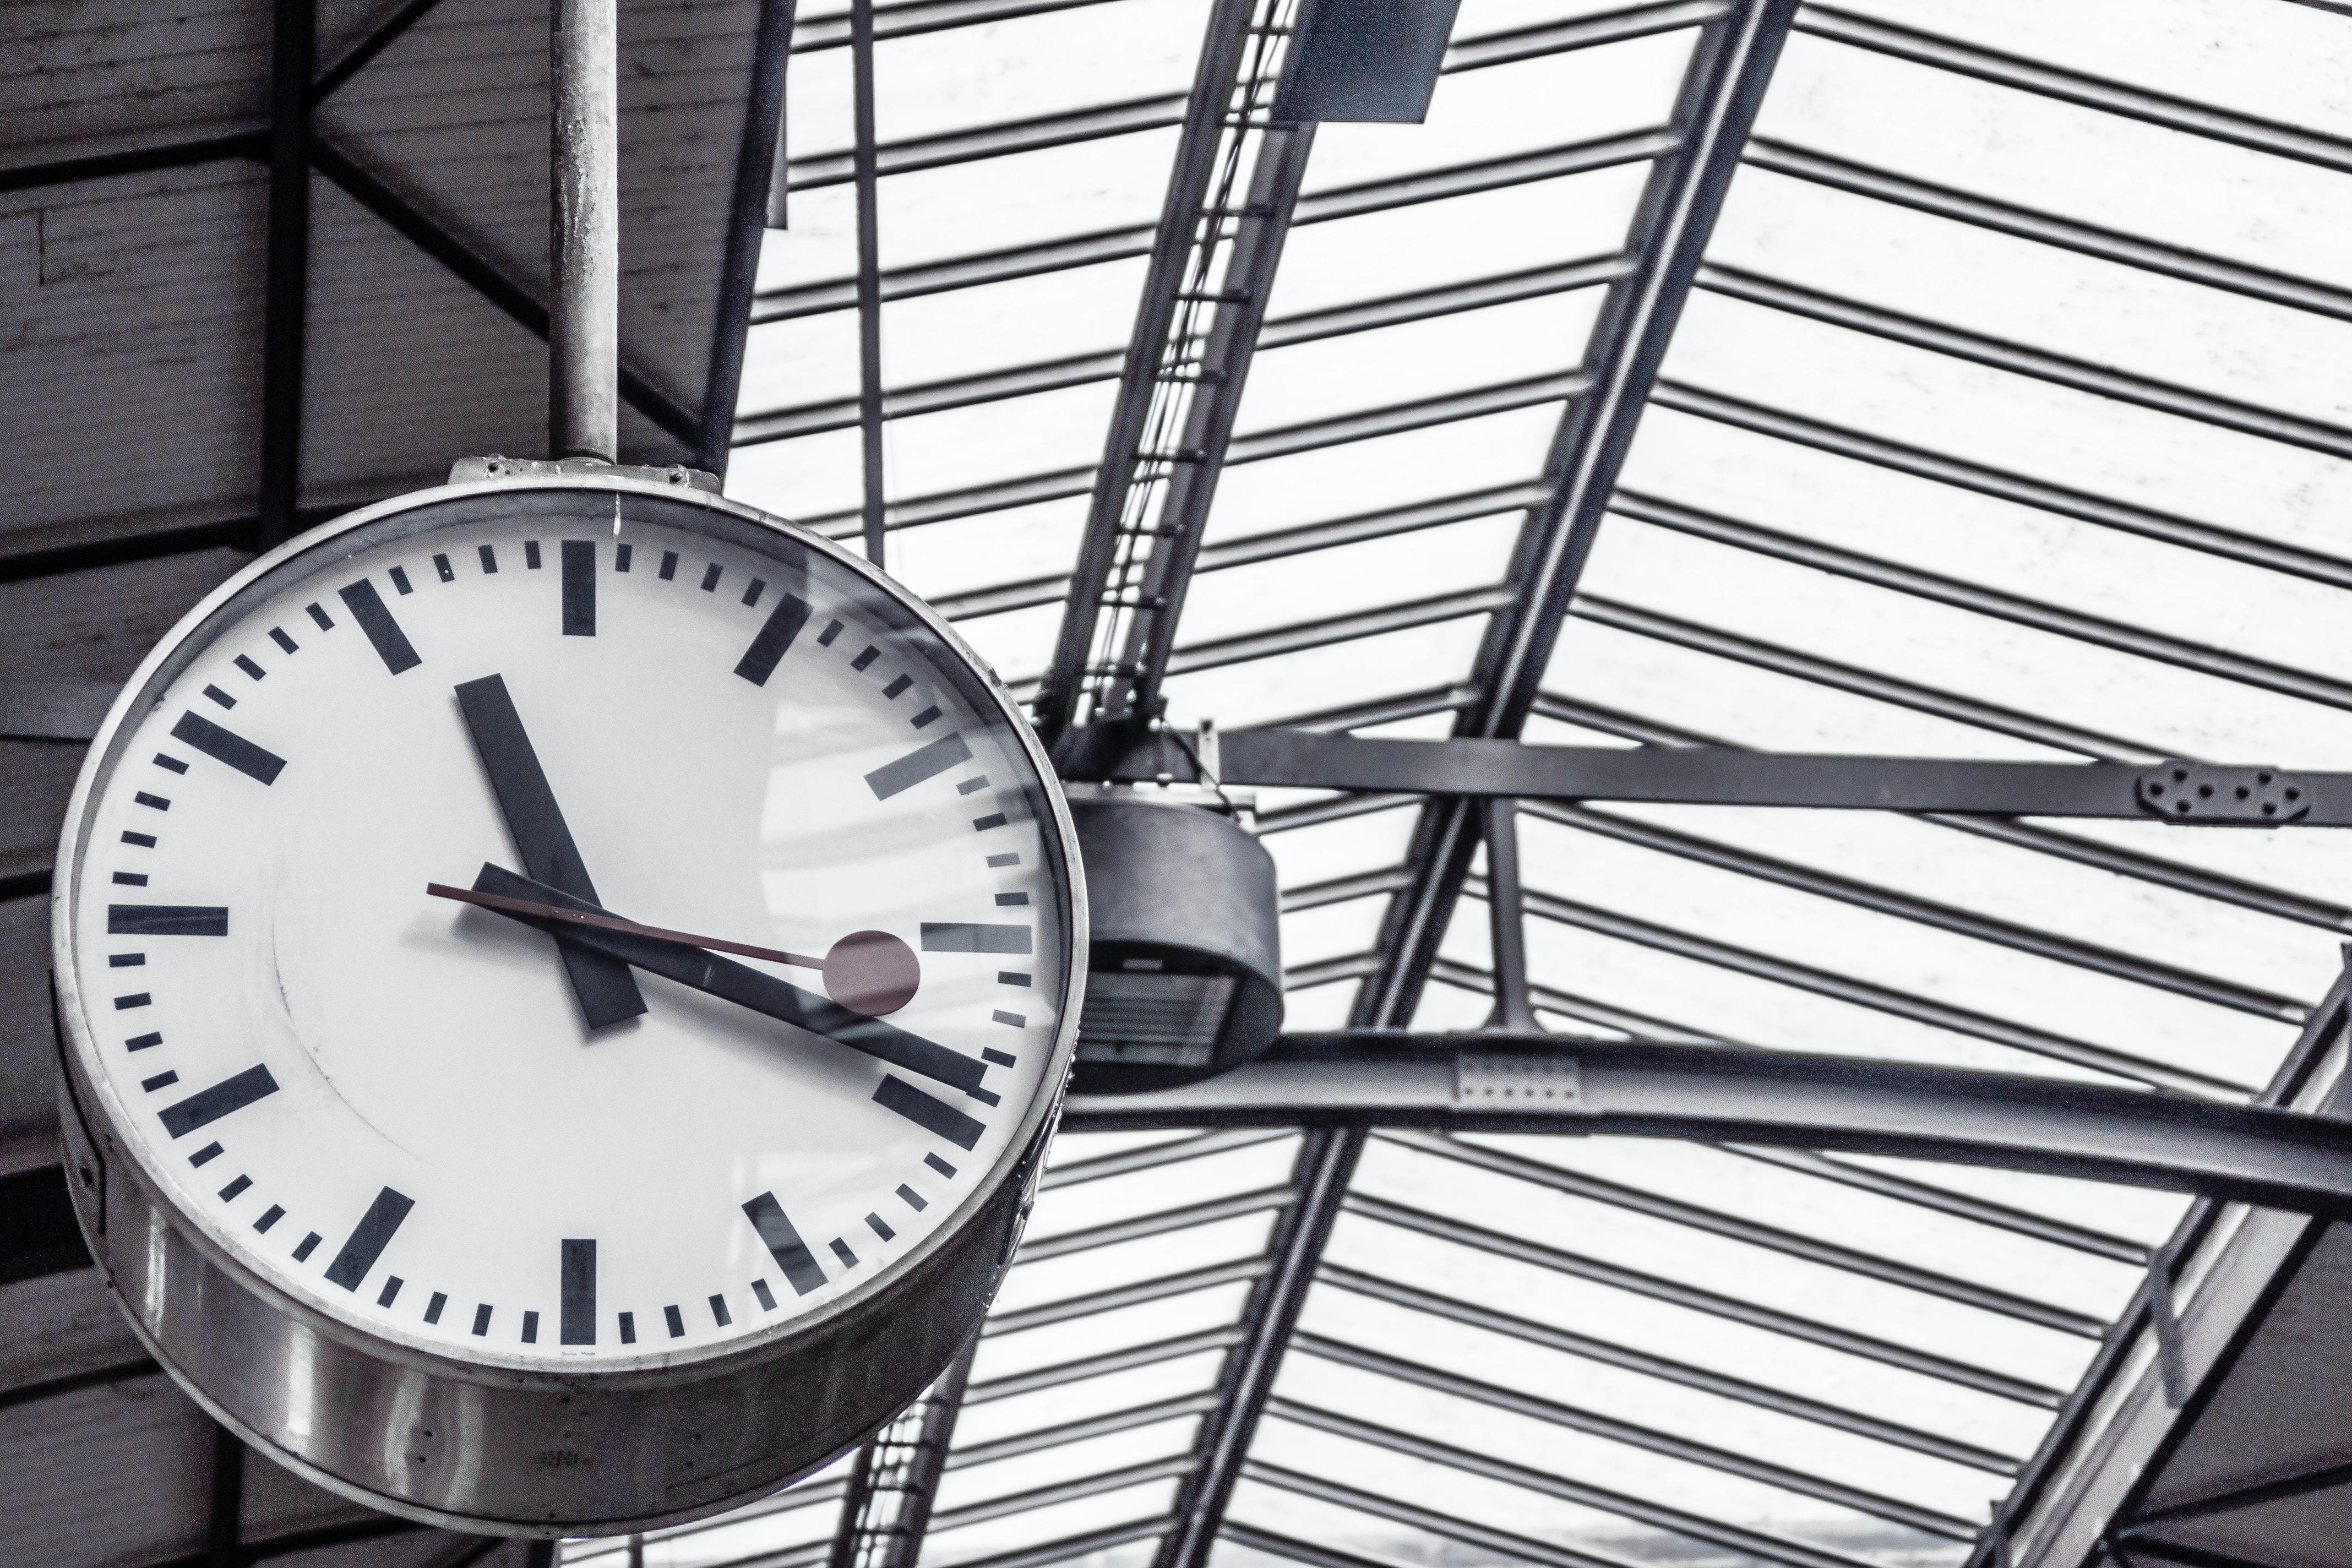 Train Station Clock Displaying 11 19 183 Free Stock Photo